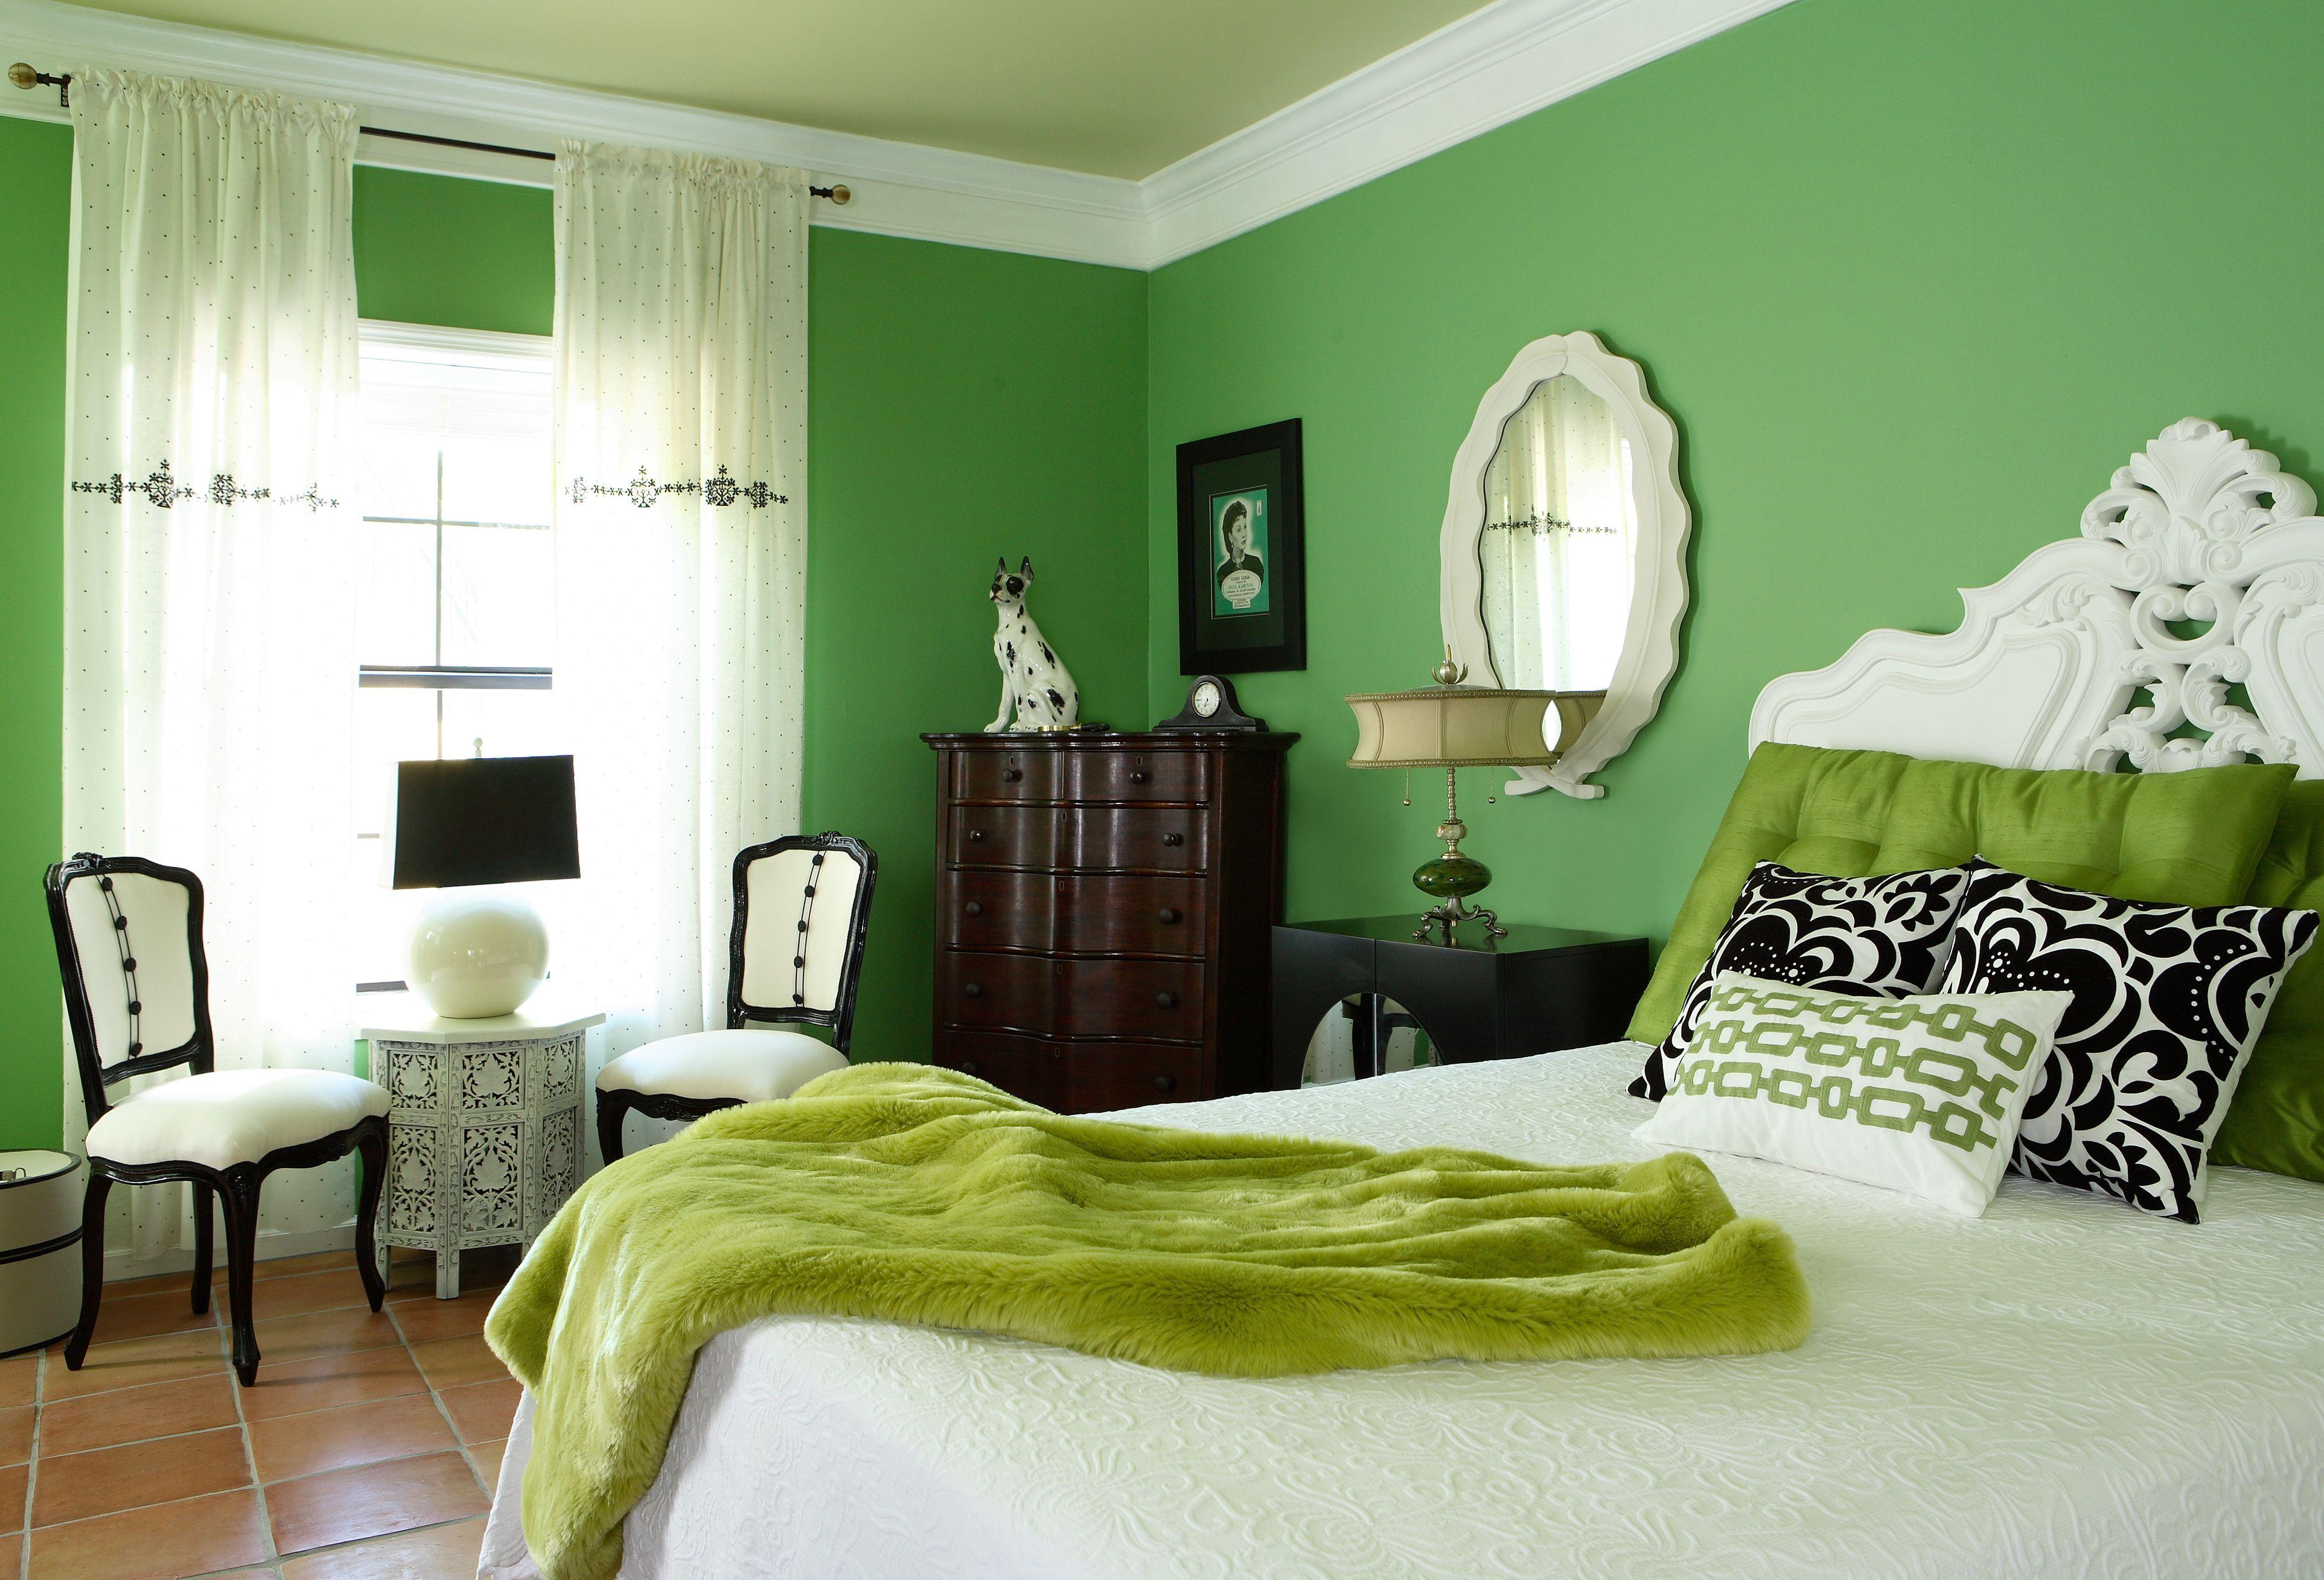 После сна все зеленого цвета